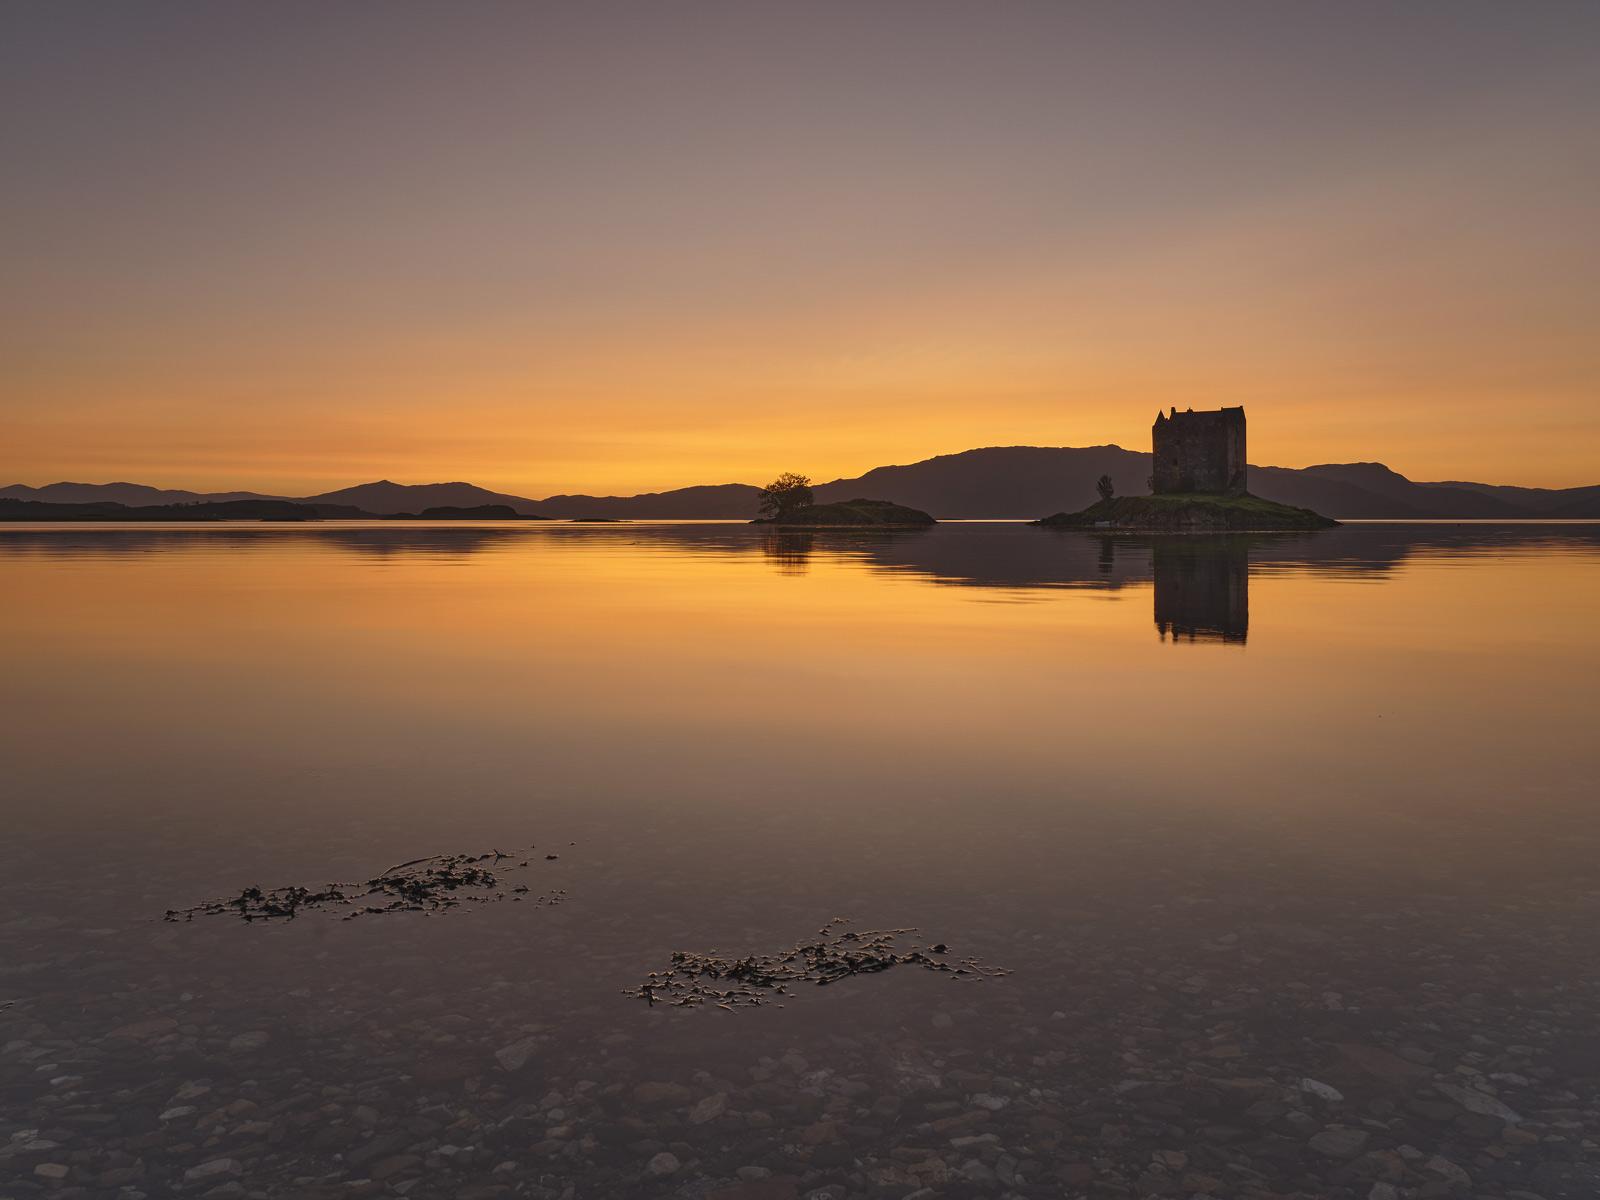 Sublime Castle Stalker, Appin, Argyll, Scotland, cloudless, sunset, clear, twilight, blue, tangerine, orange, still, gra, photo